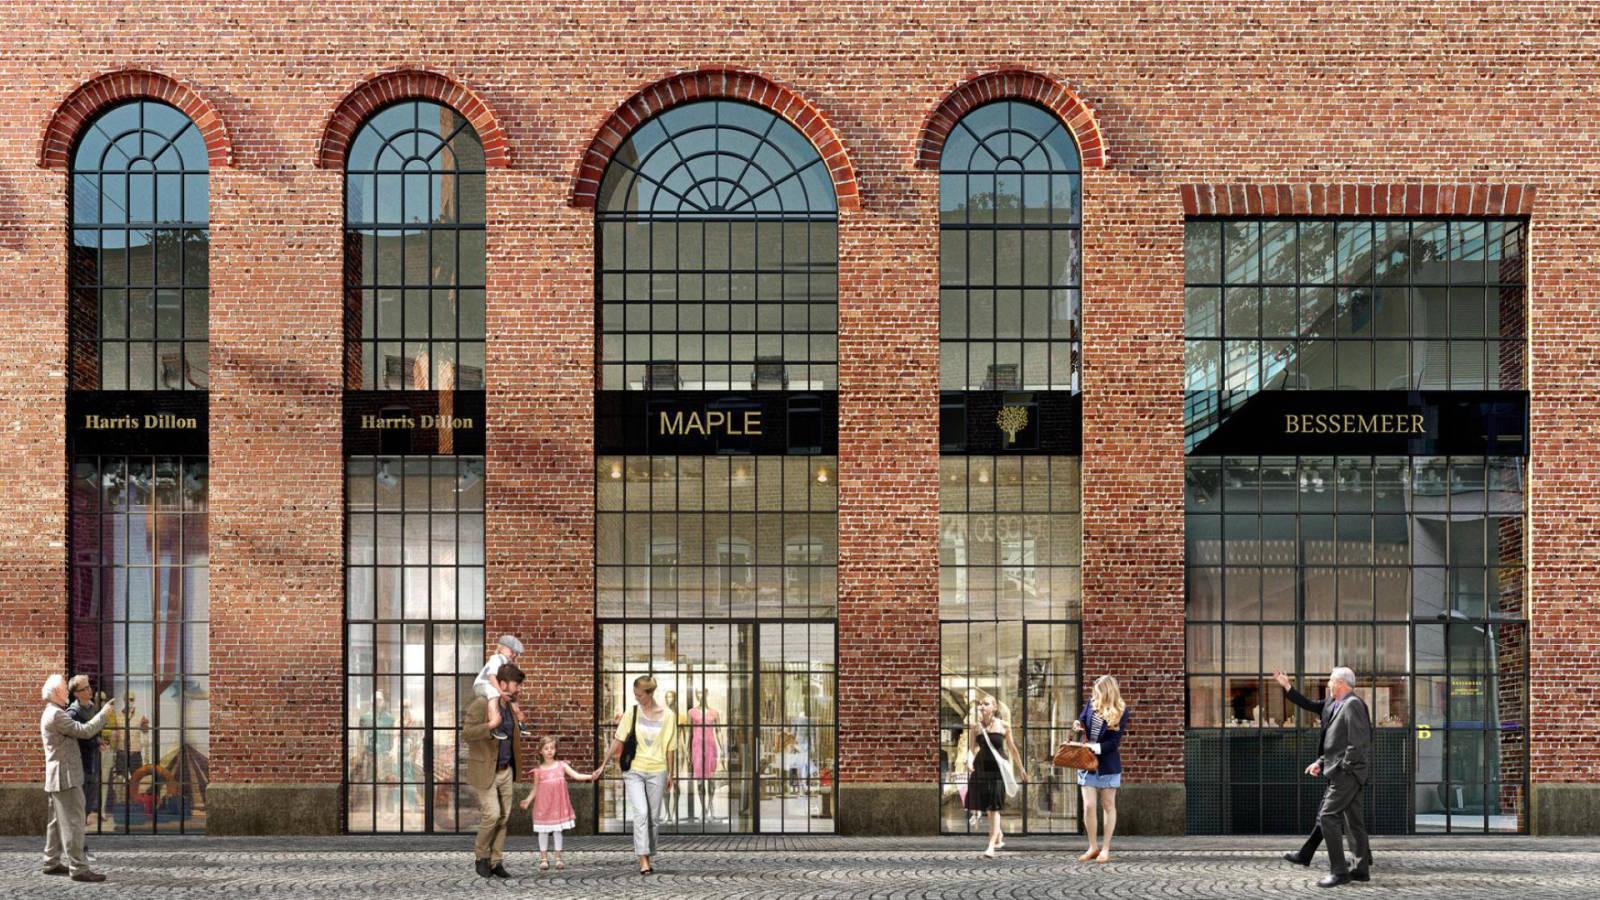 HIGH STREET SHOPPING - Aker Brygge Masterplan - SPOL Architects